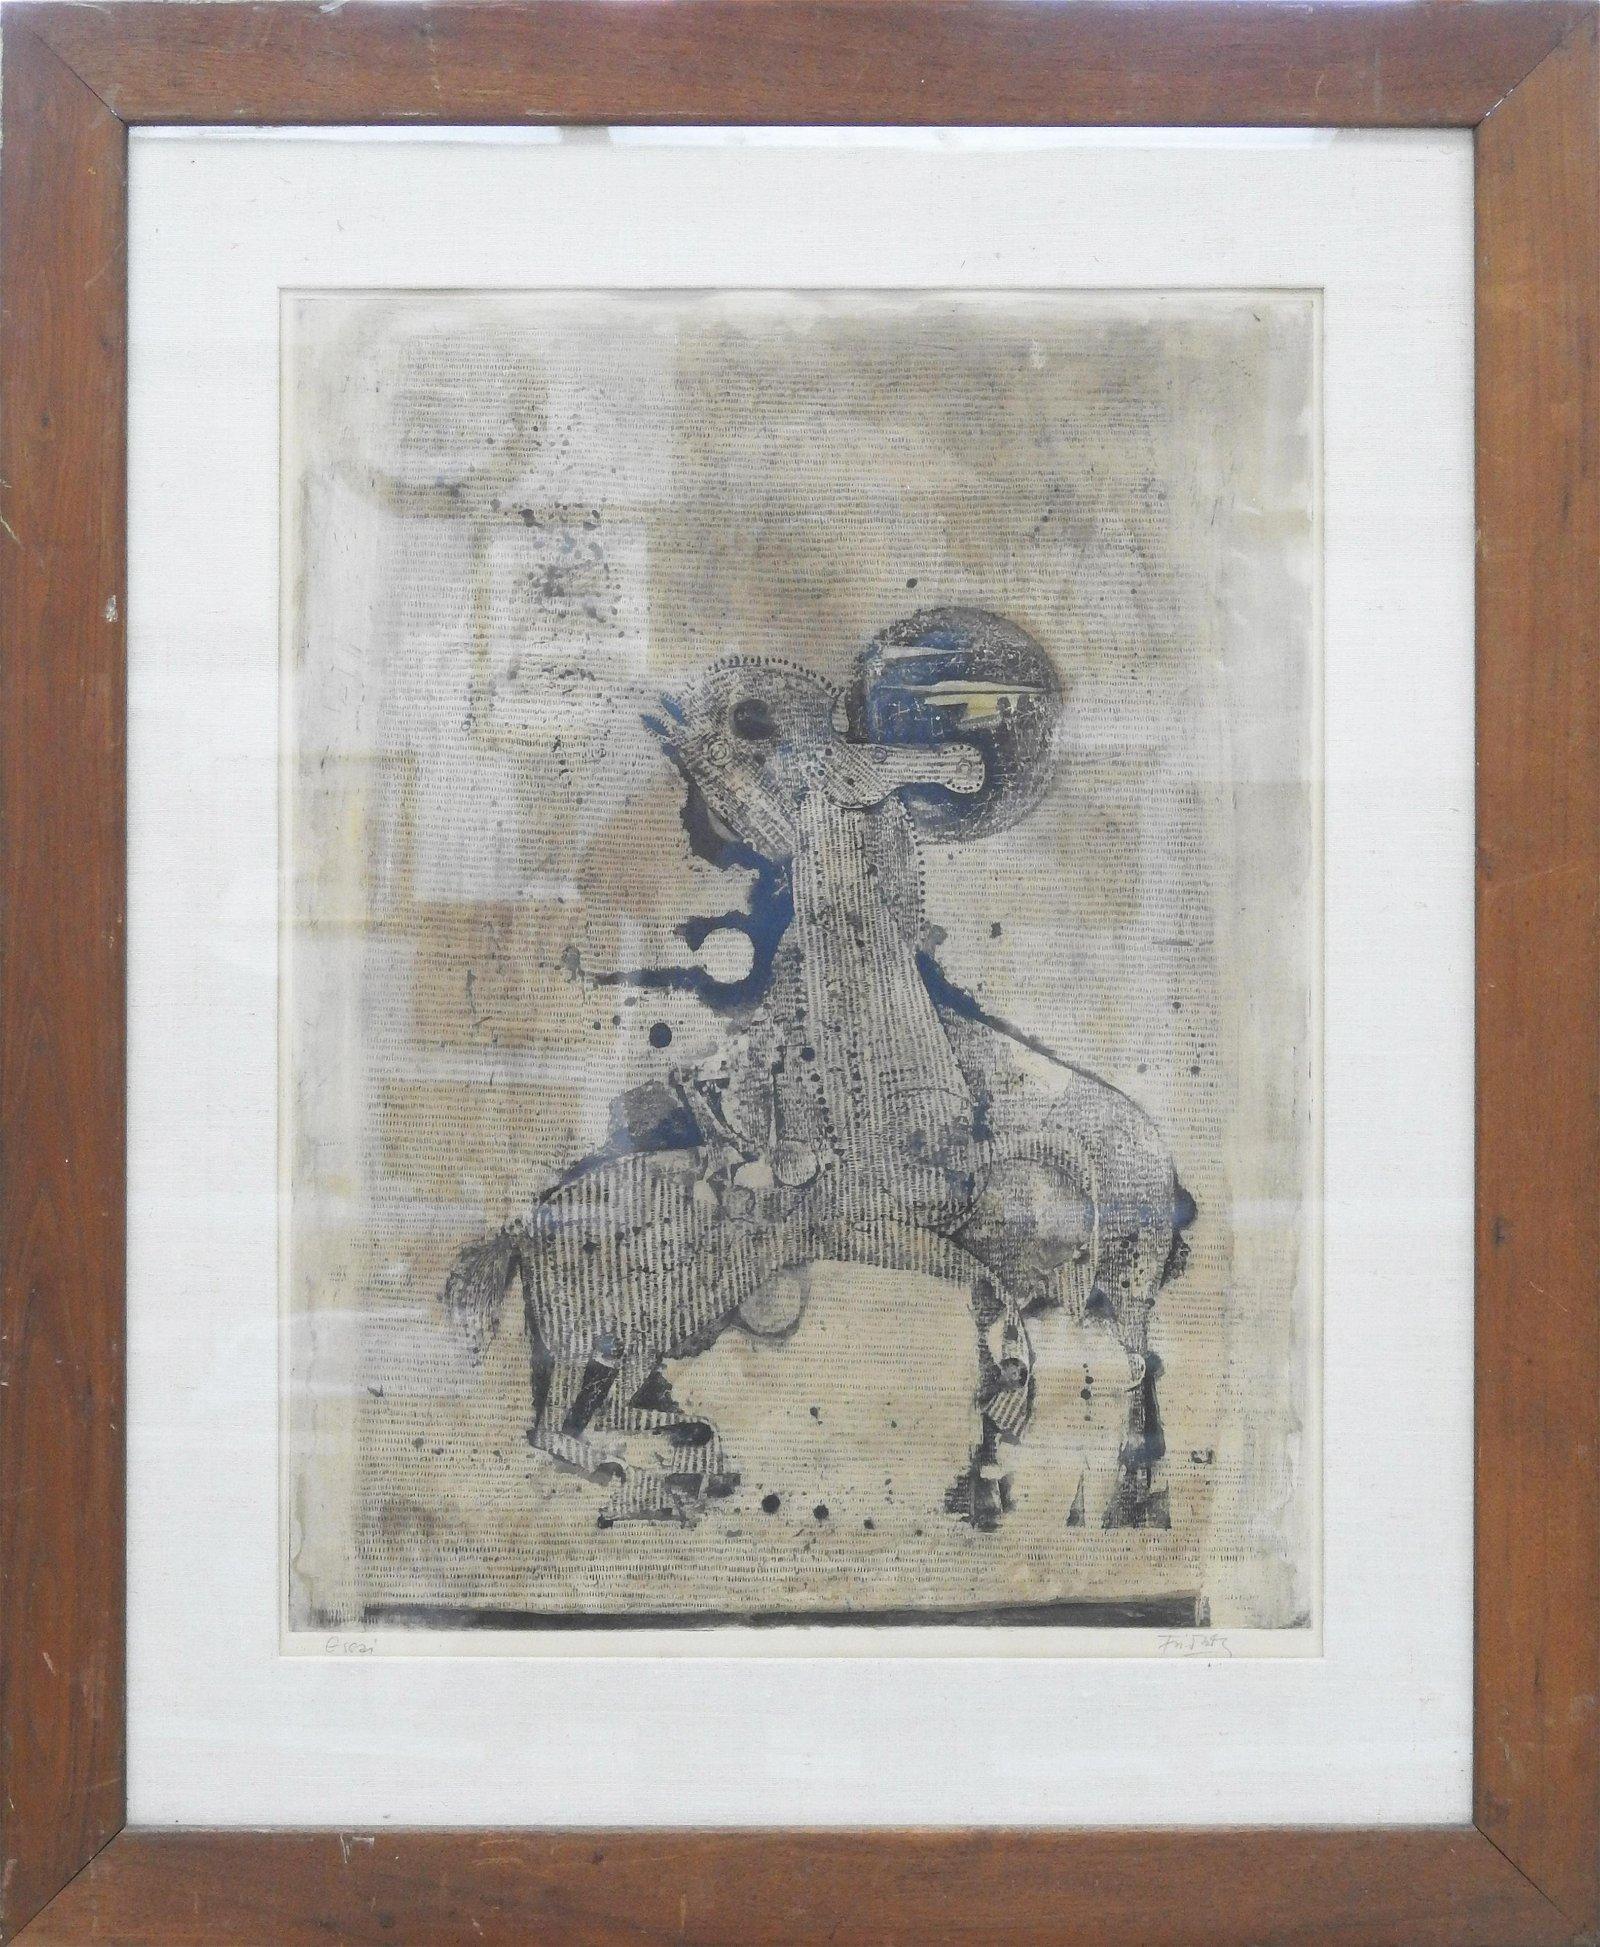 Johnny Friedlander etching with aquatint